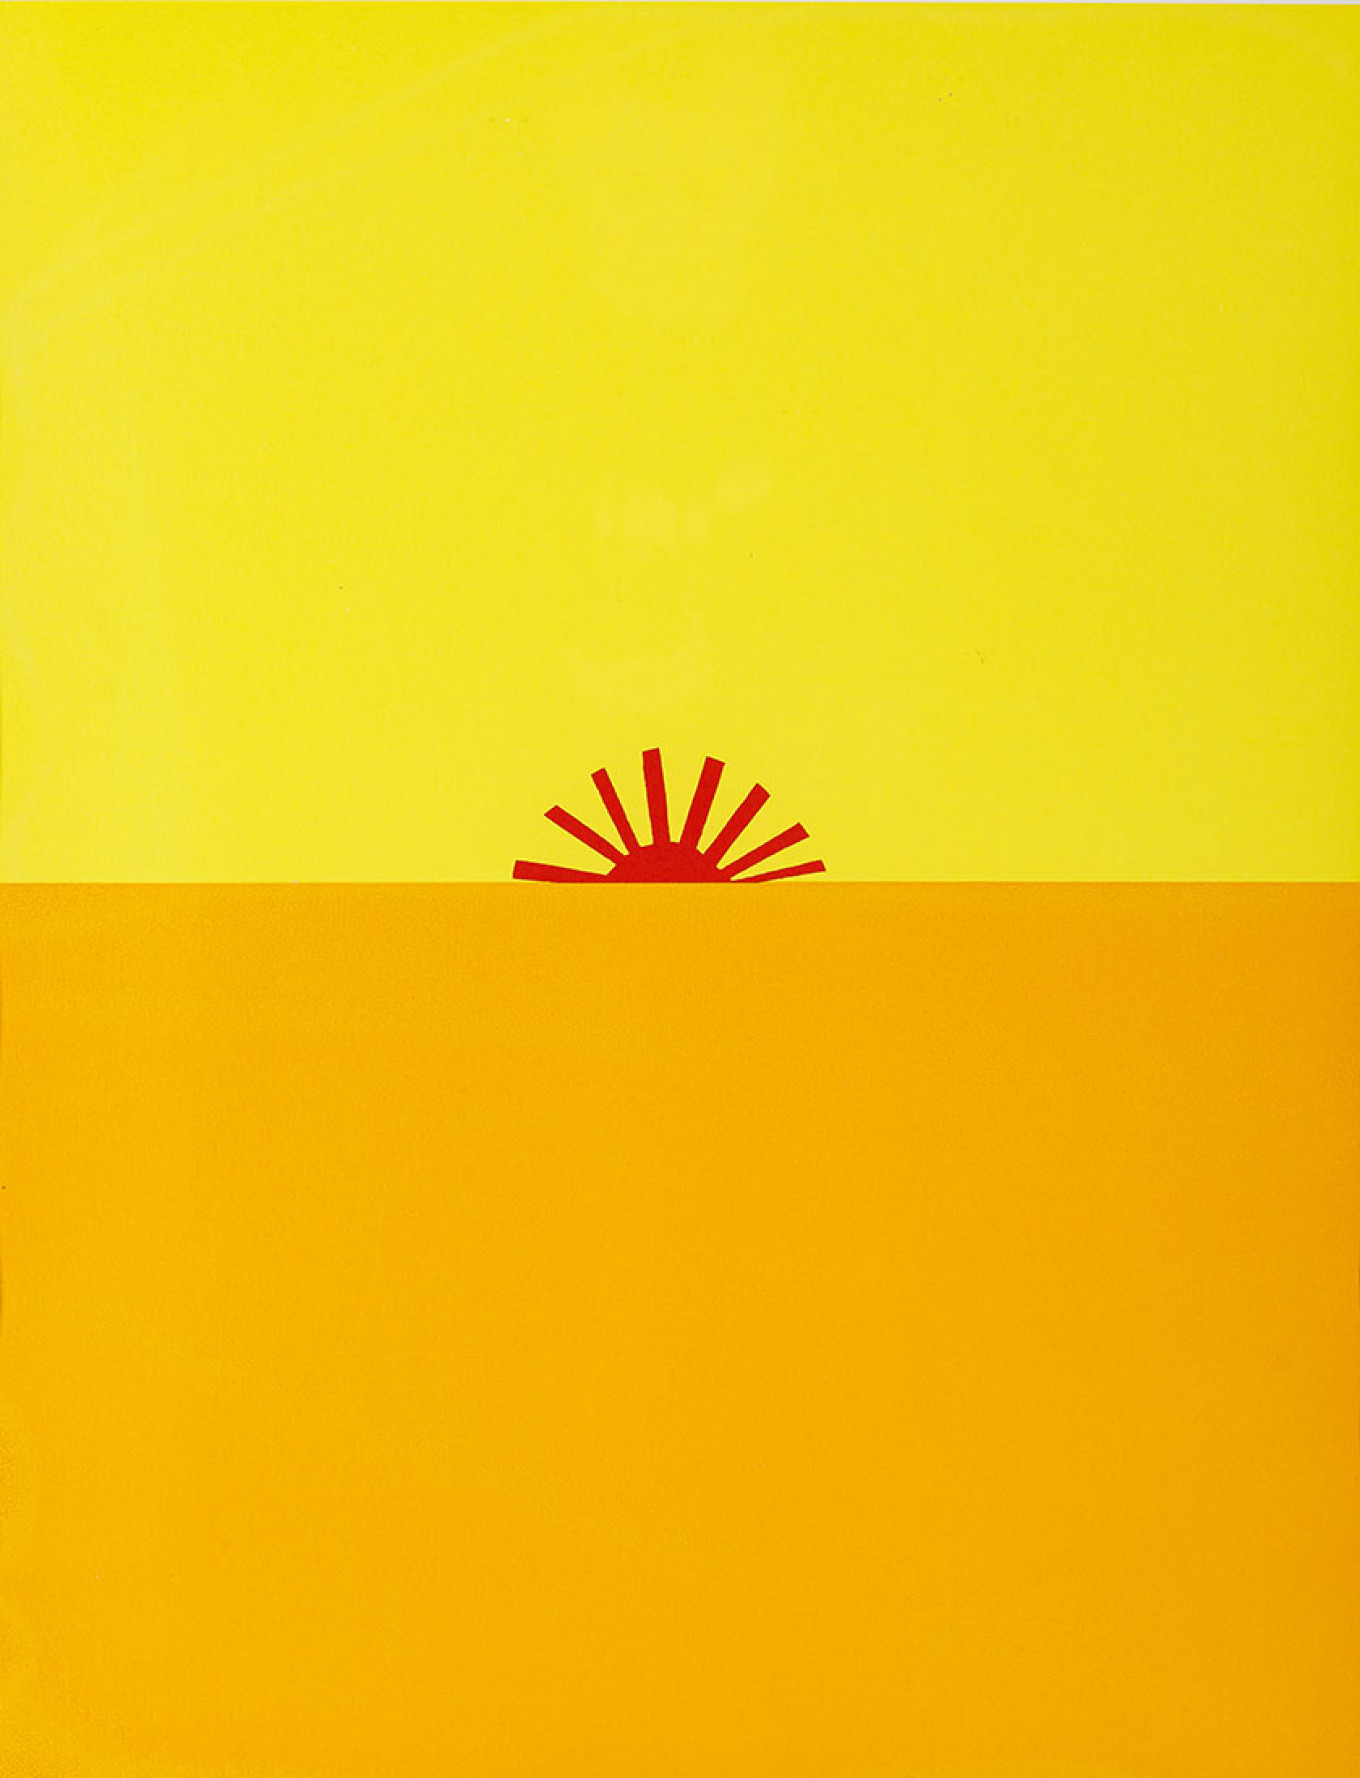 """Sun"" by Timur Novikov Sinara Art Gallery"